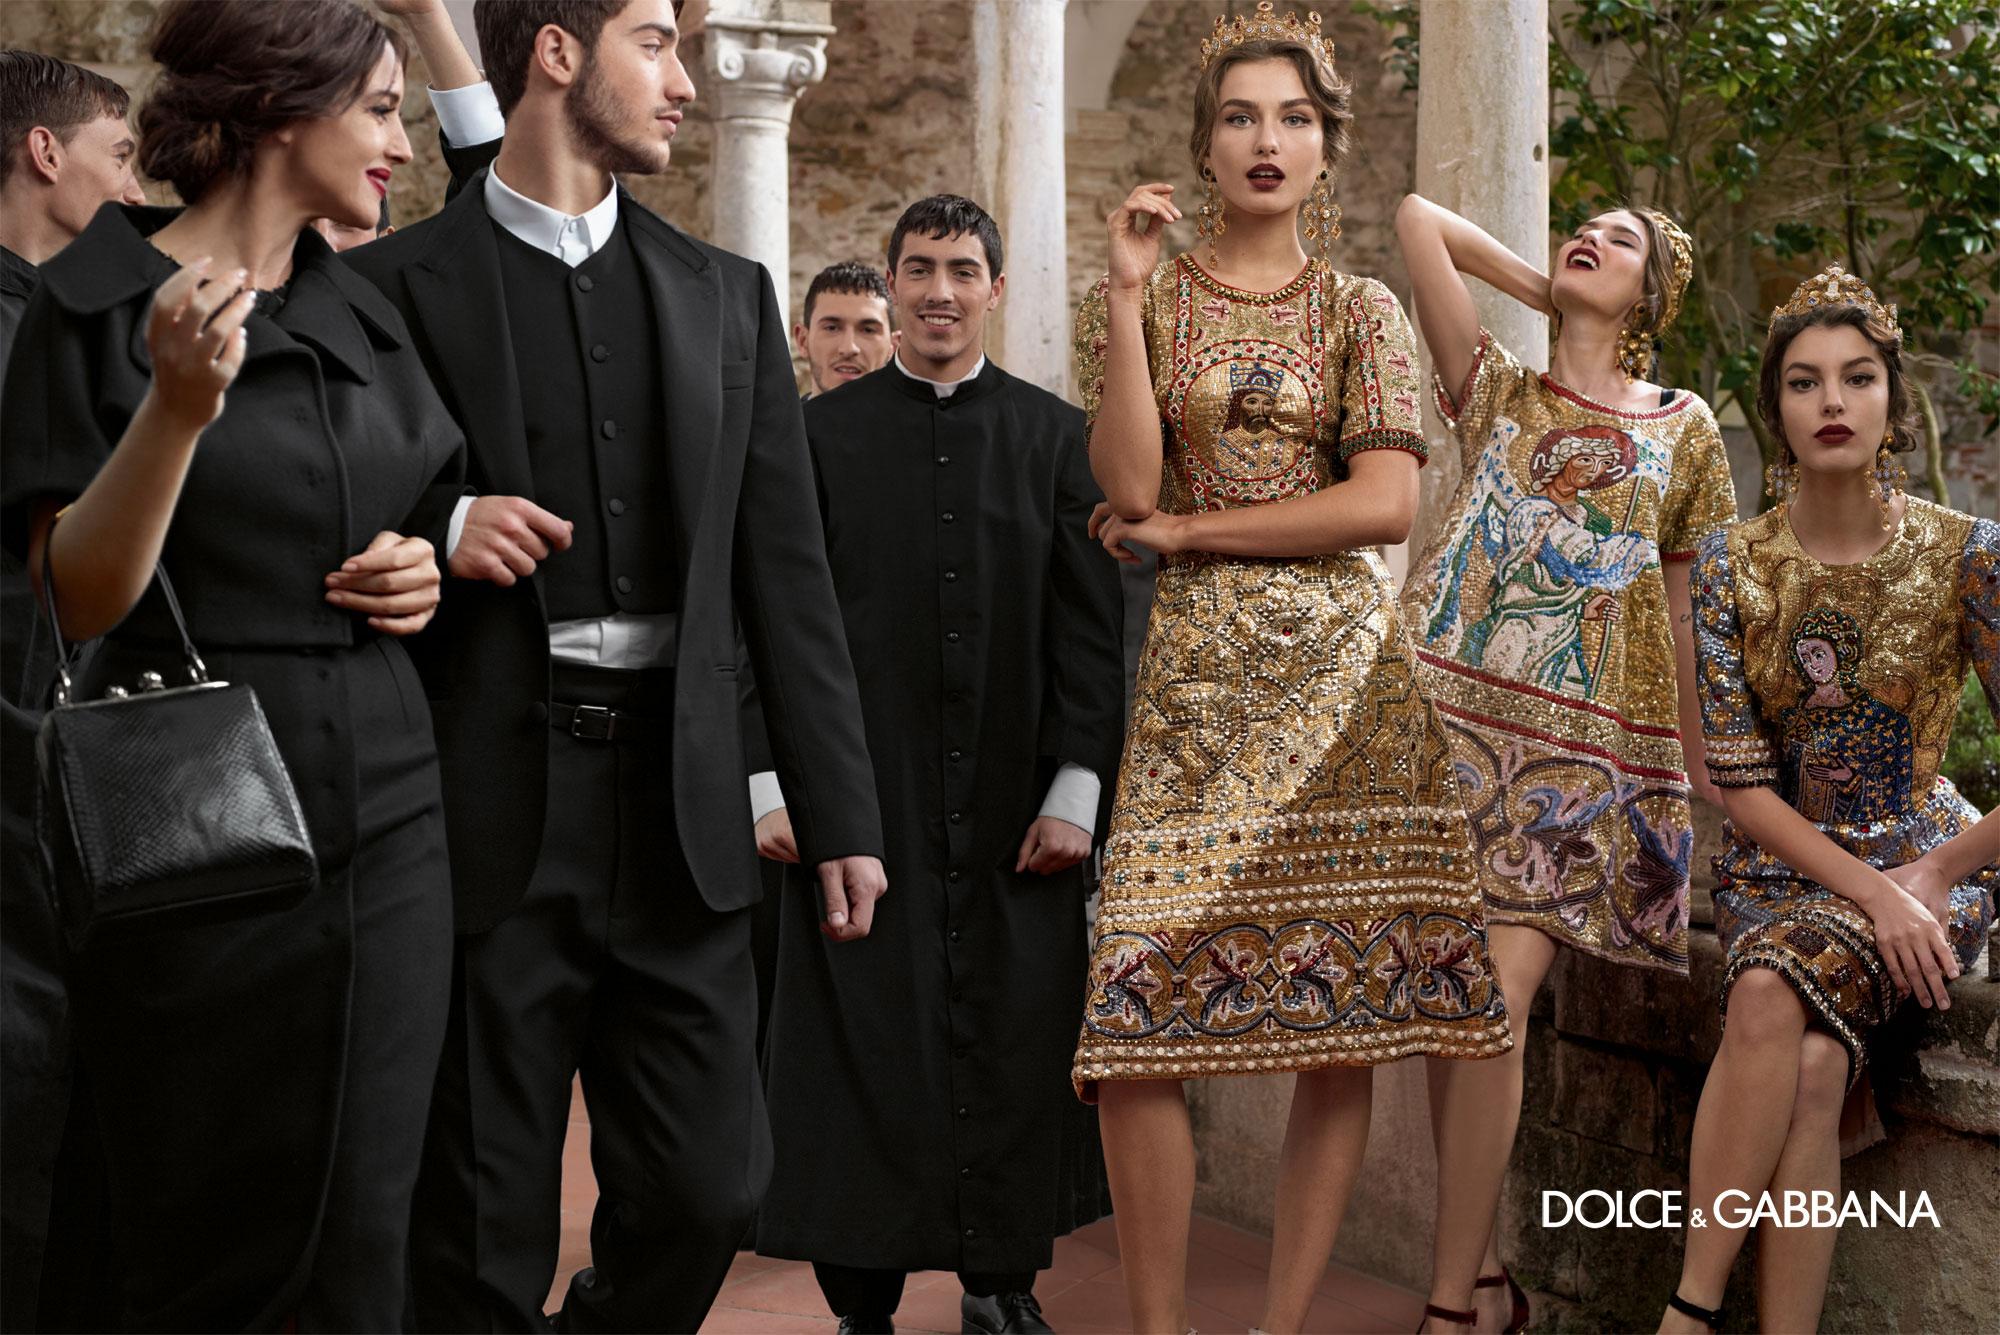 dolce-and-gabbana-fw-2014-women-adv-campaign-7